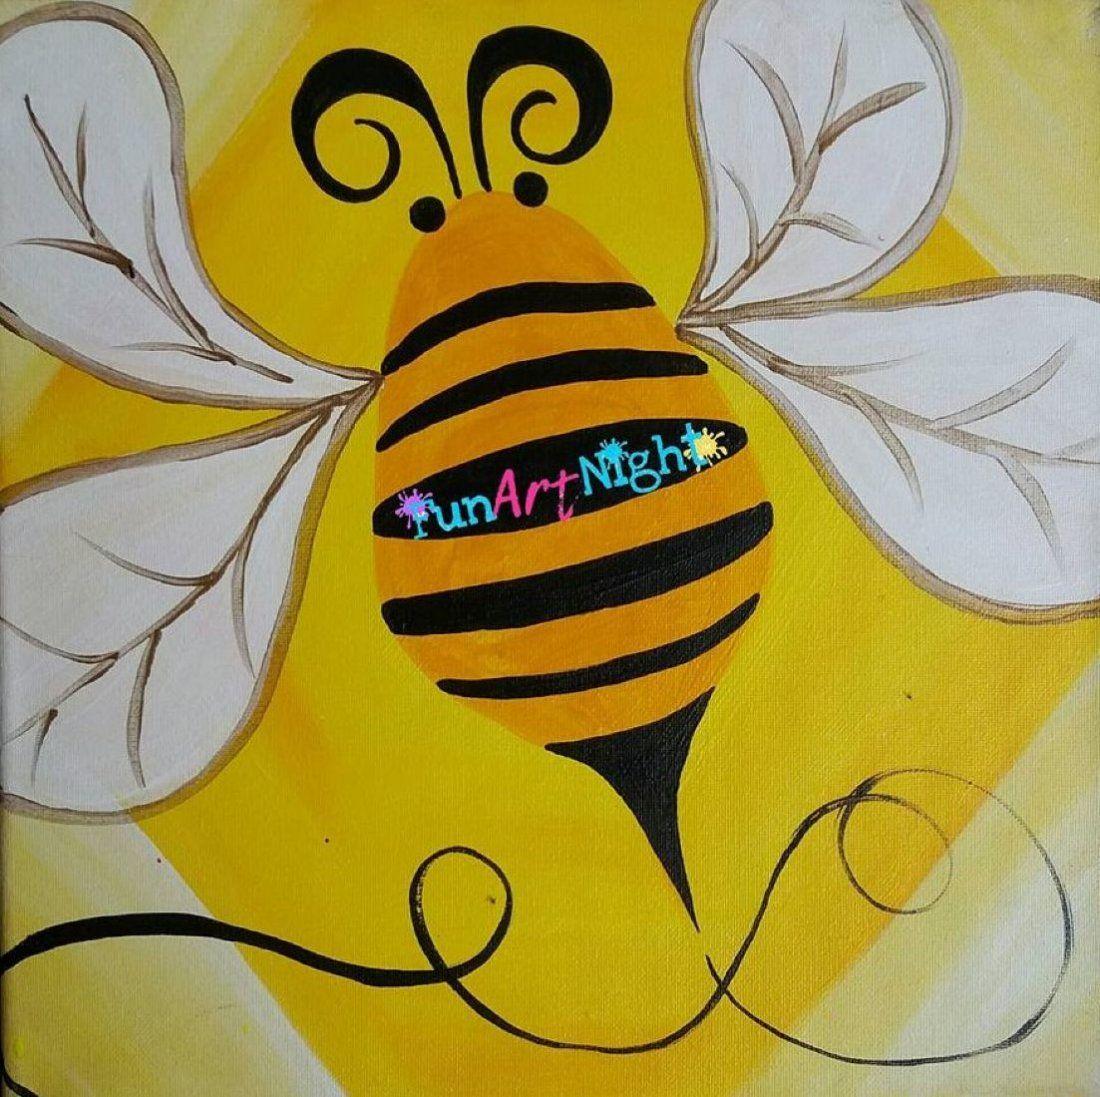 Kids Art Night Buzzy Bee in Waynesboro